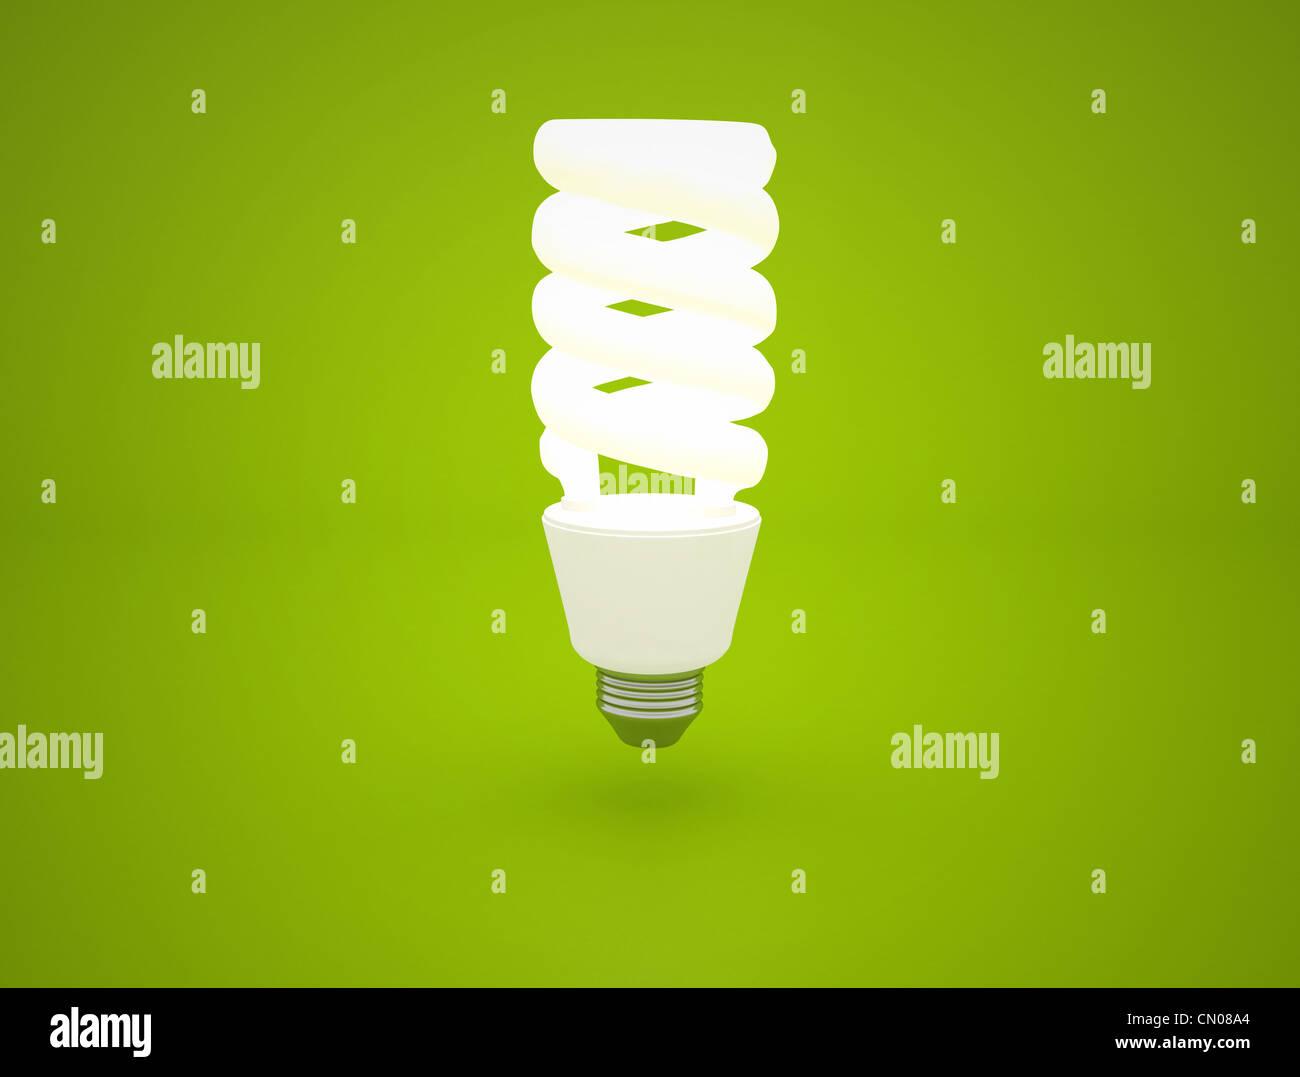 Bombilla de luz brillante idea sobre fondo verde Imagen De Stock